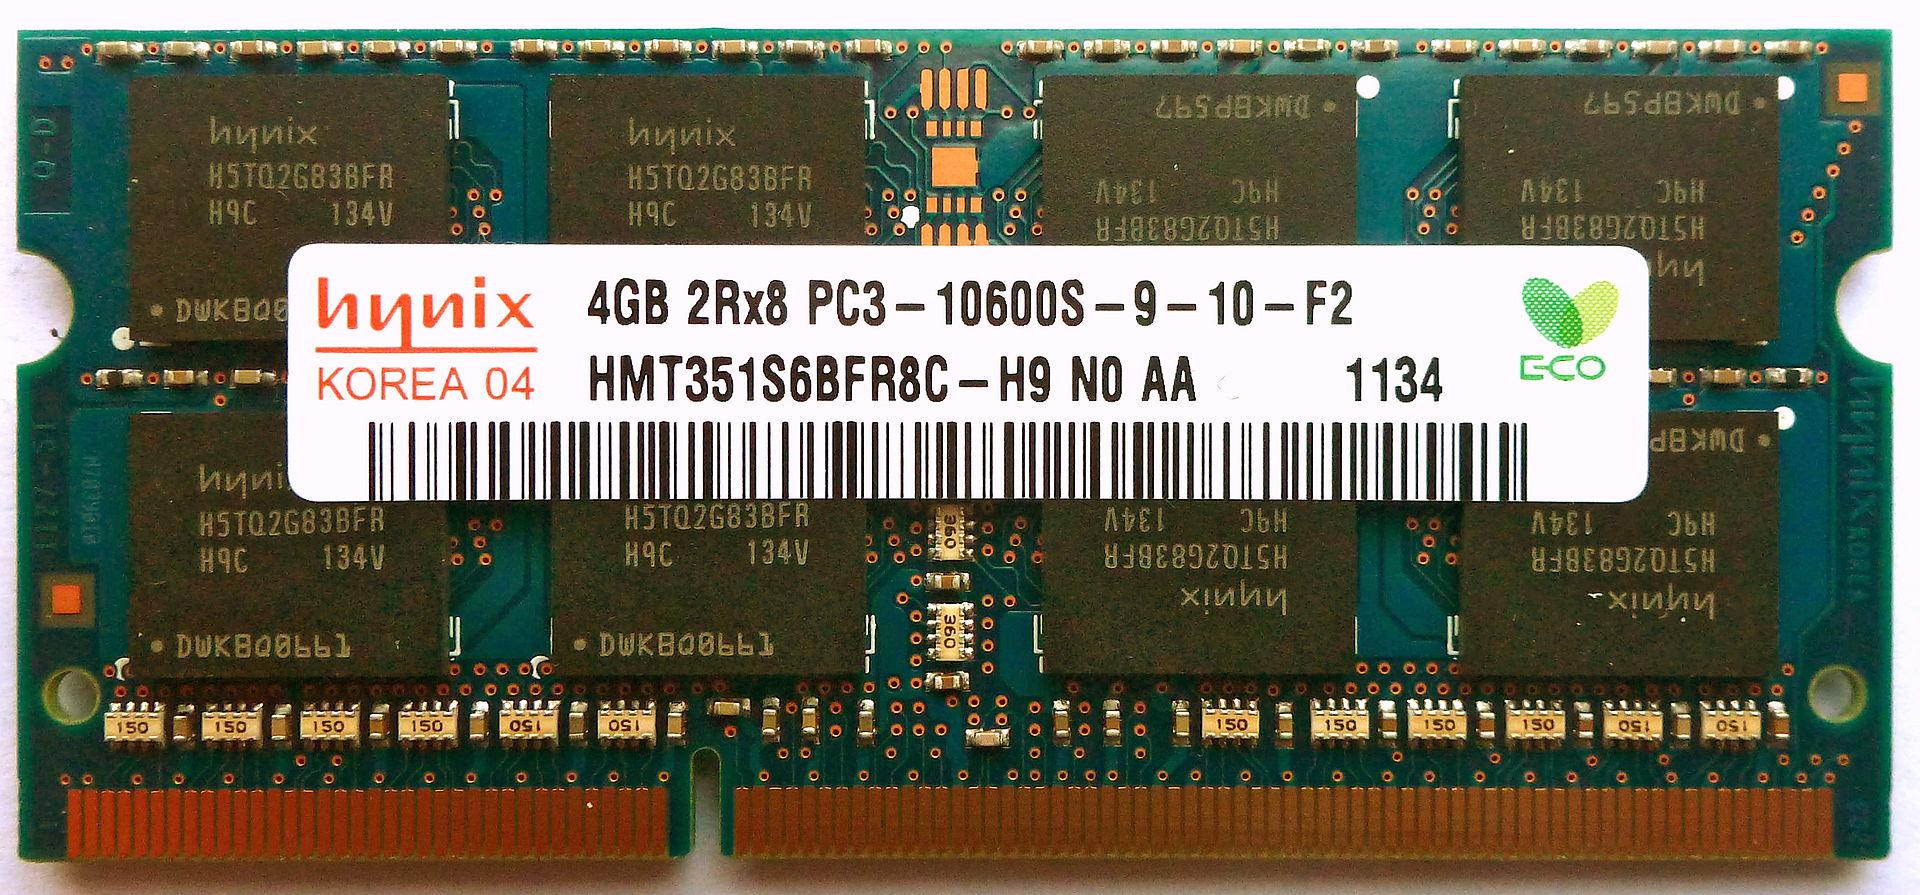 Electronics Irc Archive For 2016 12 28 Tc9400 Vfc Pll Fm Demodulation